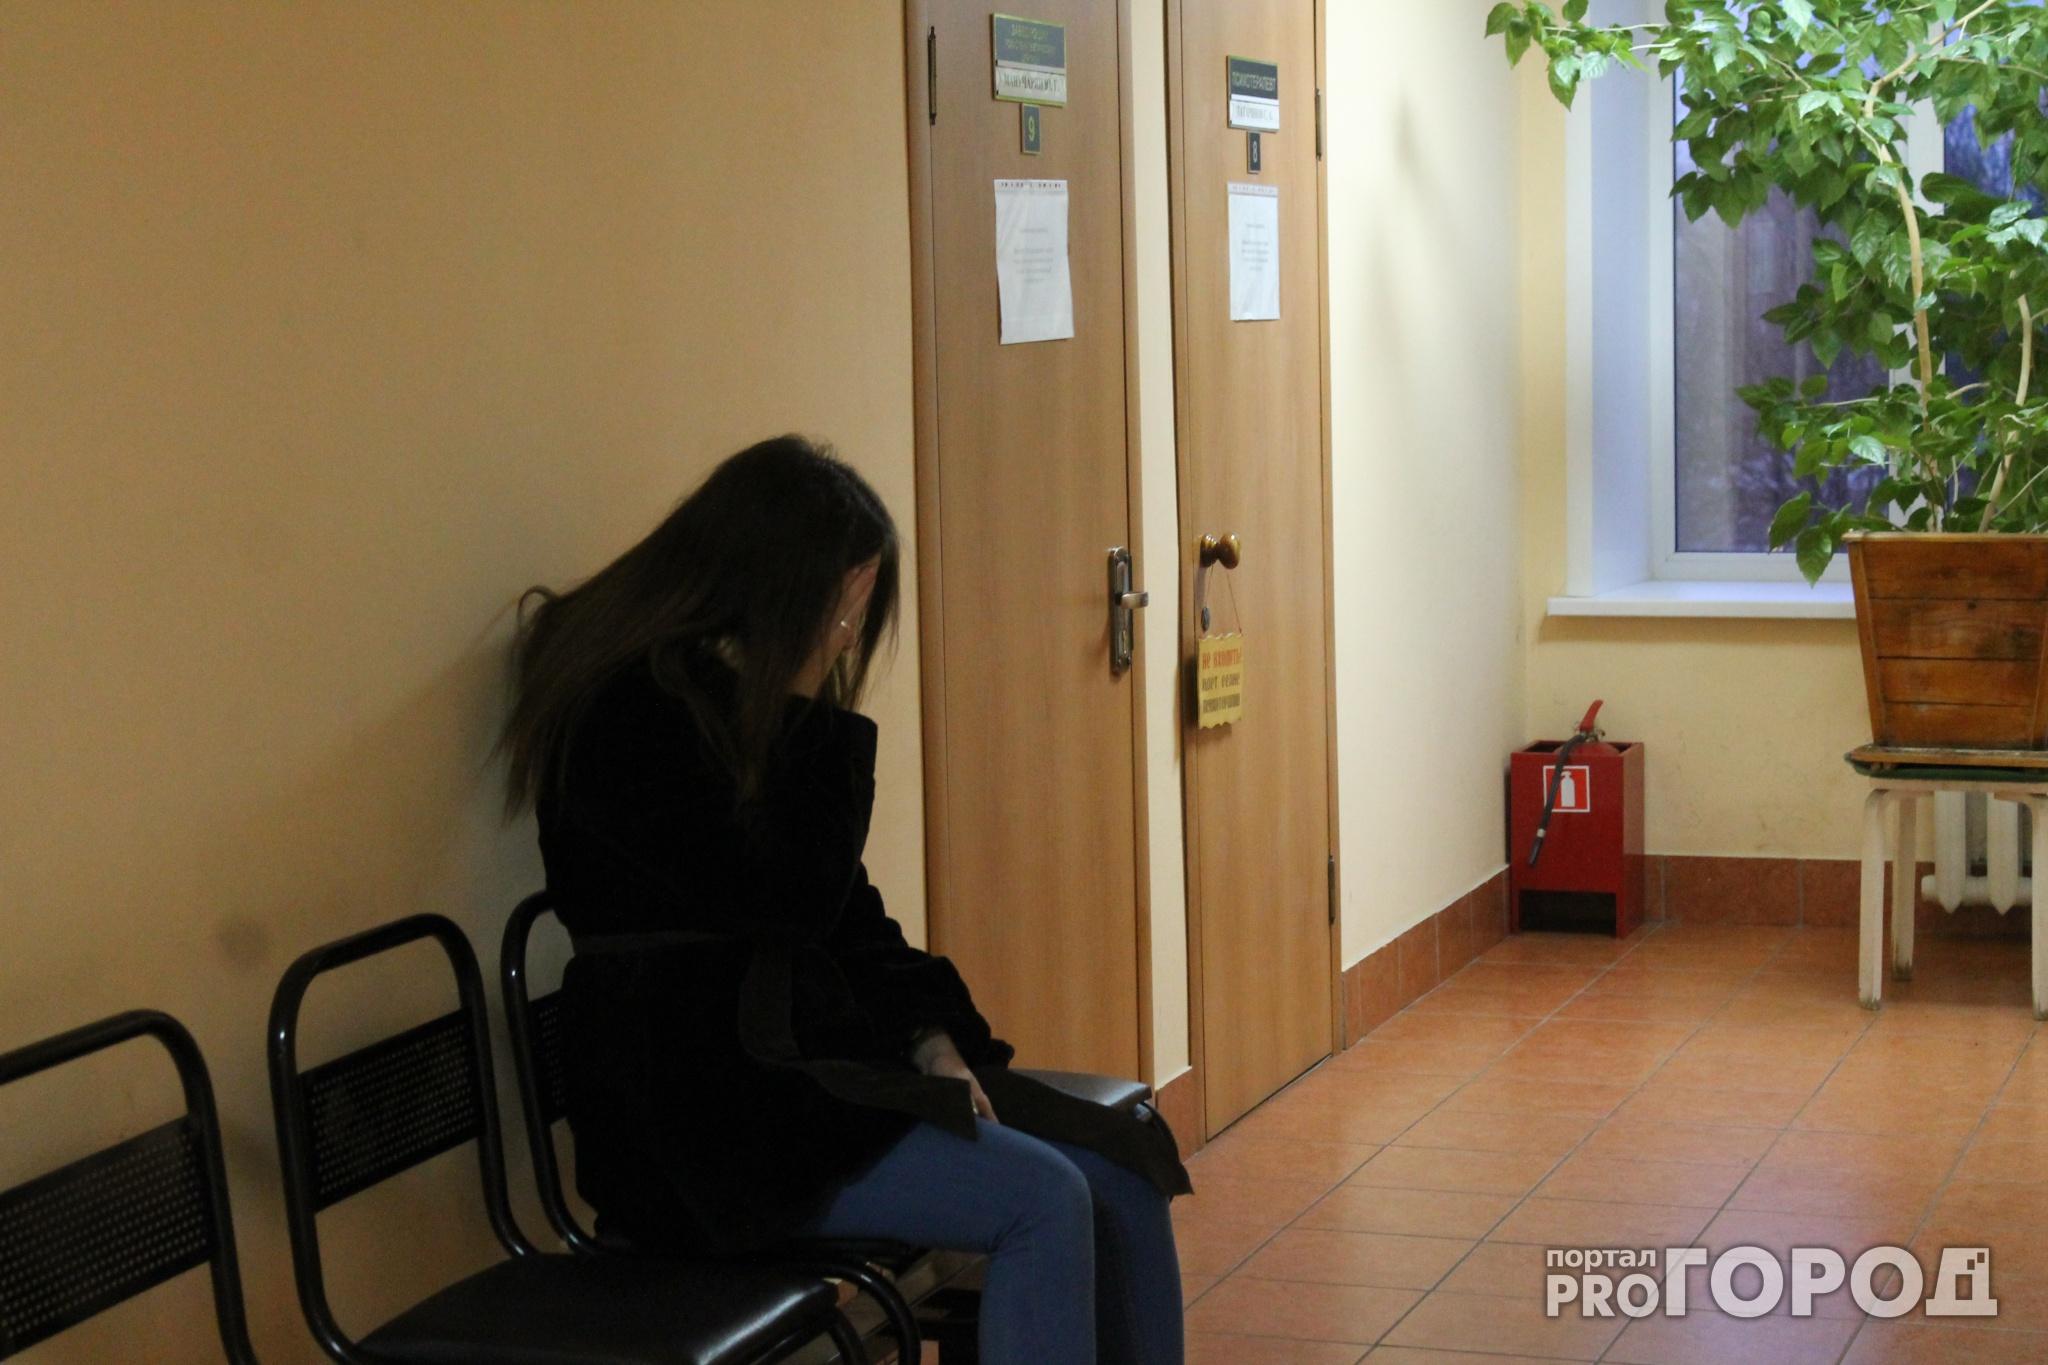 В Чепецке бизнесвумен поместили в психиатрический диспансер